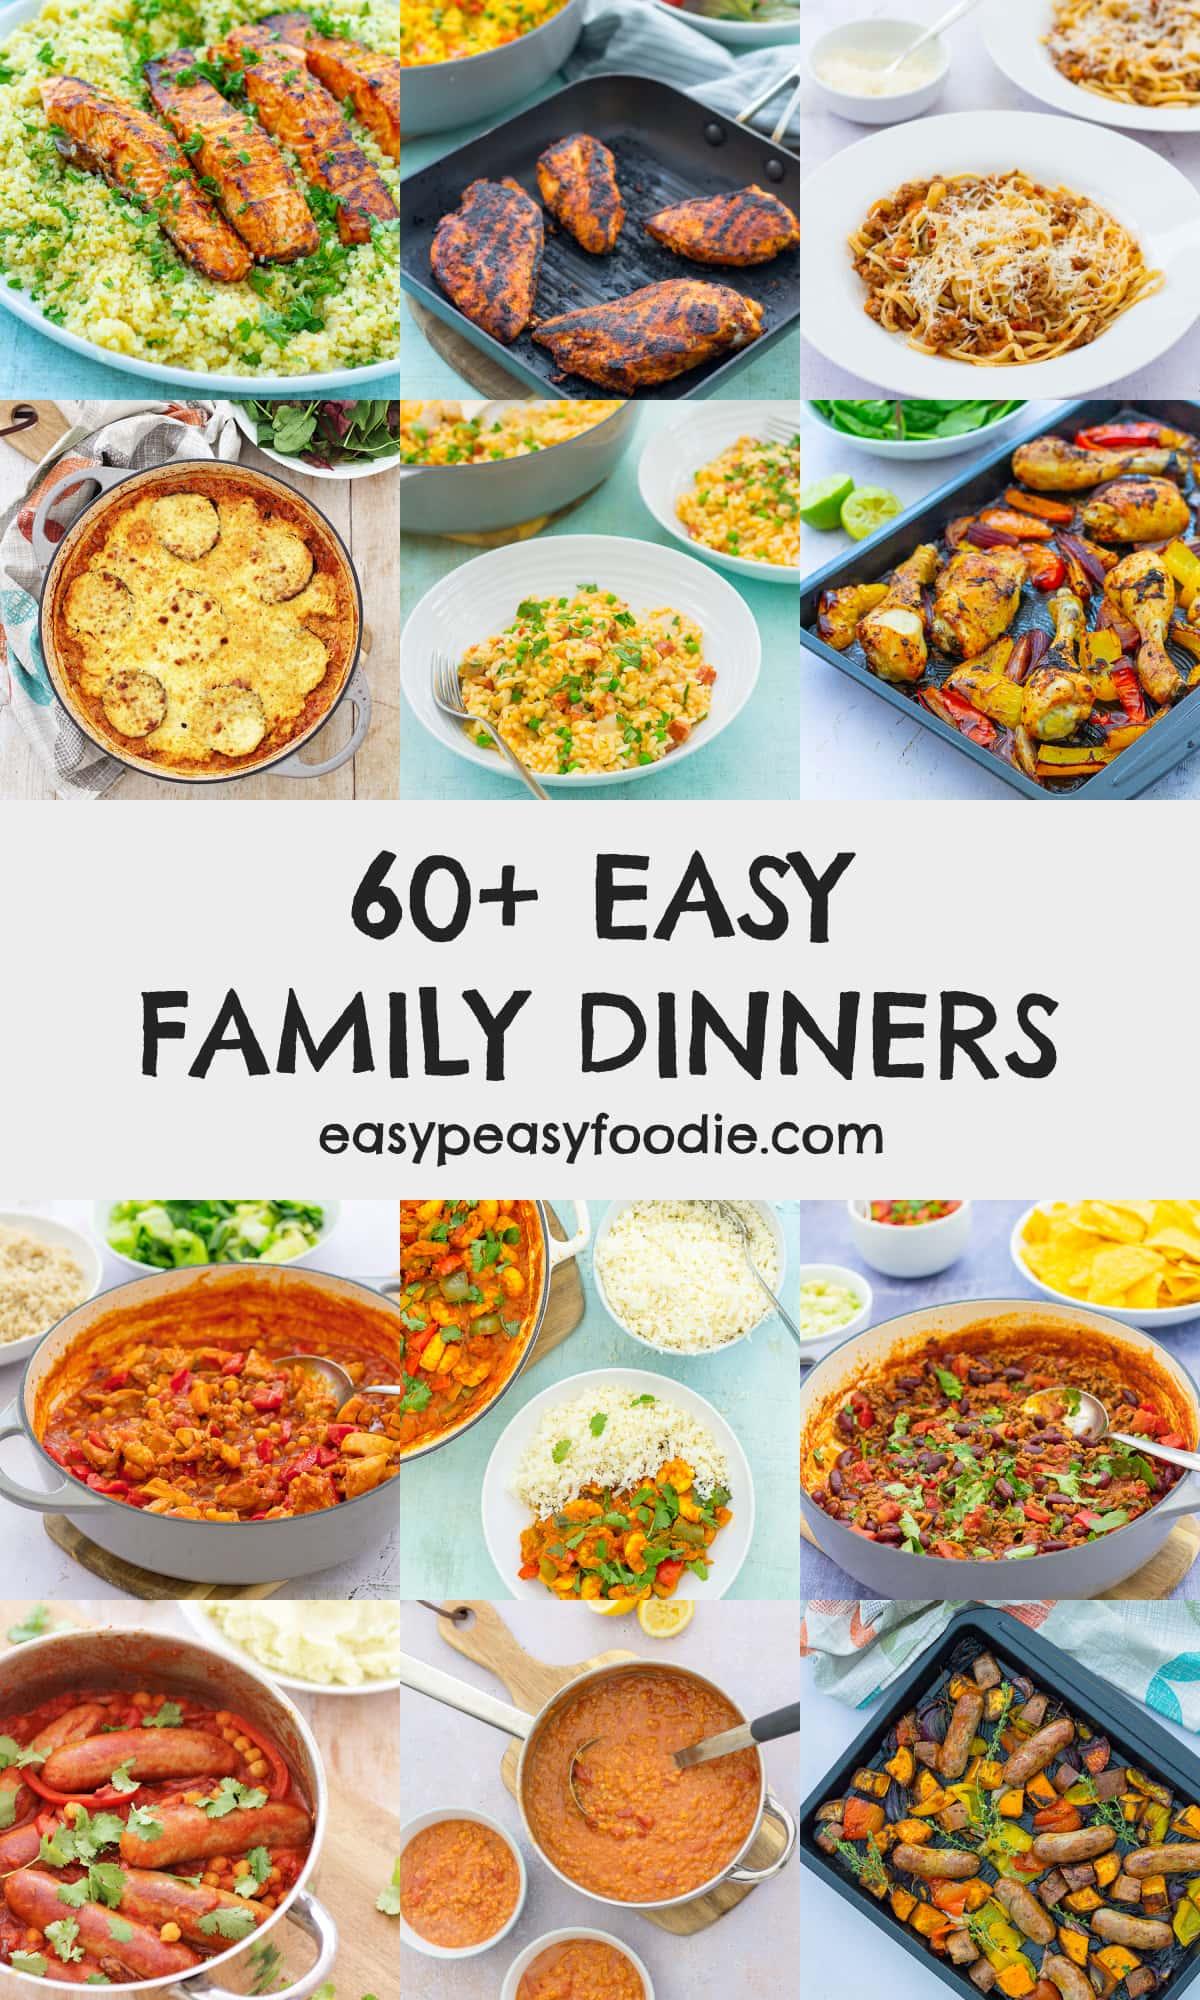 60 Easy Family Dinners - pinnable image for Pinterest